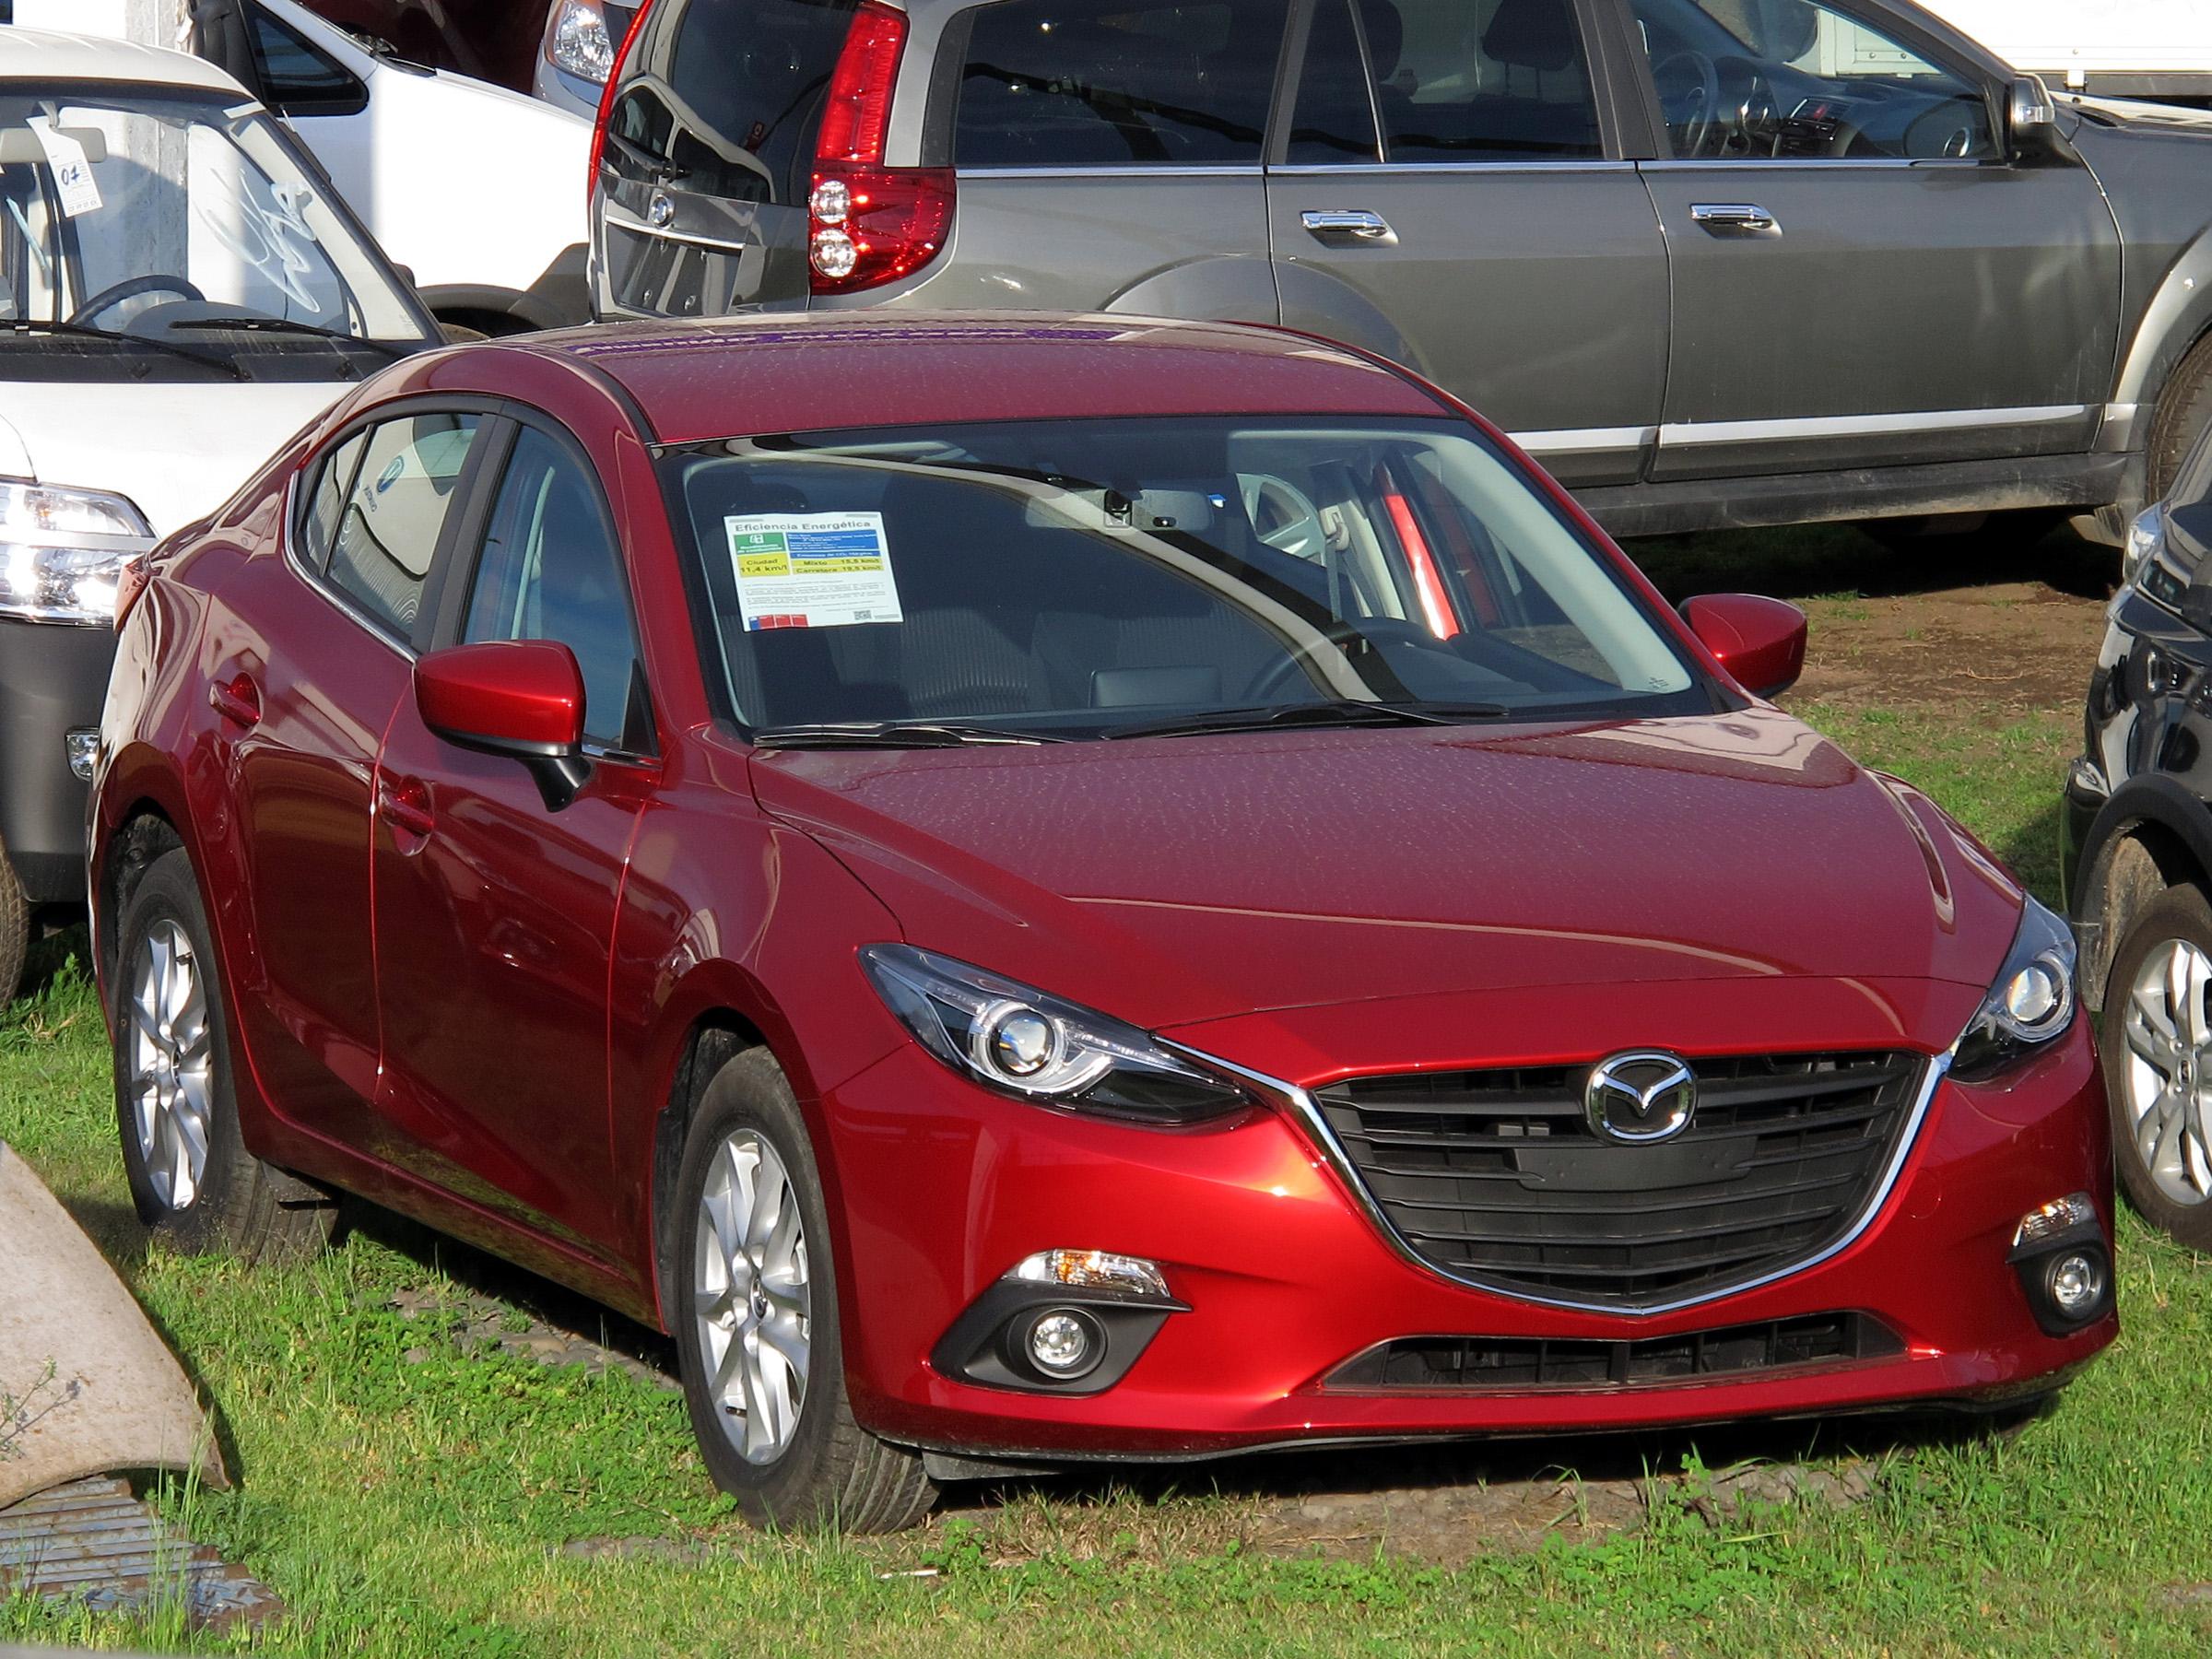 cars for sale series hatchback sedan maxx shacks mazda bm used